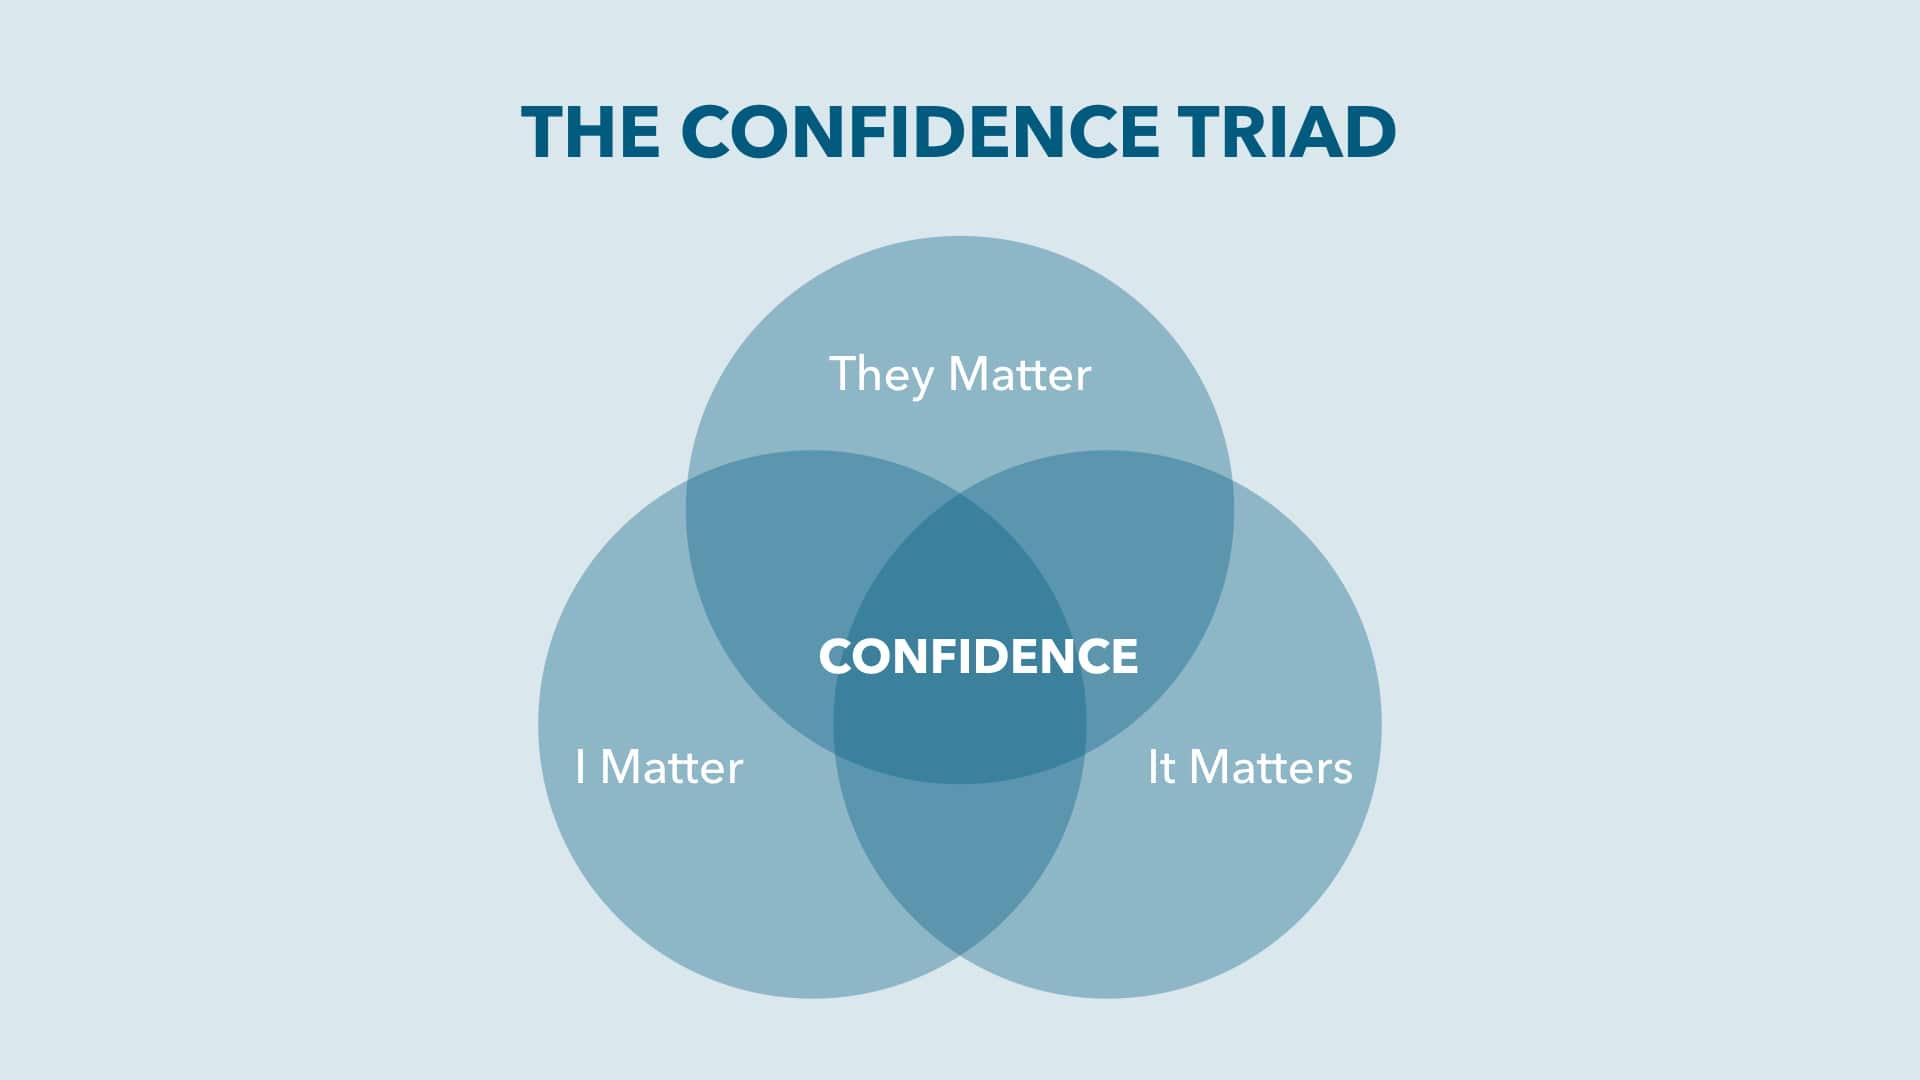 Confidence Triad